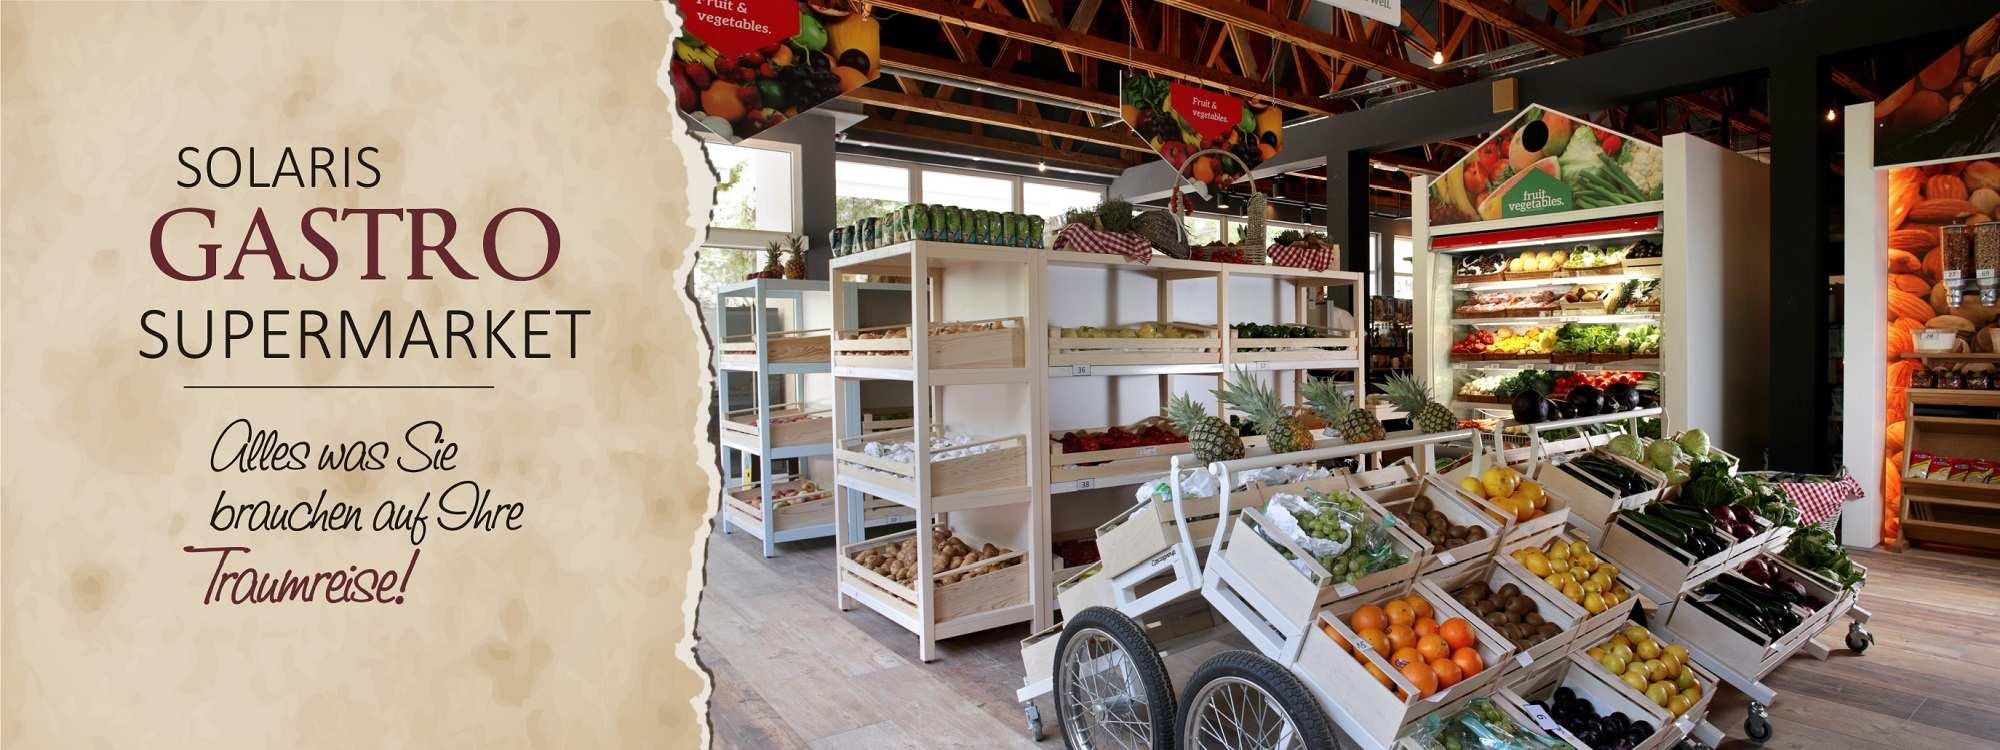 Solaris_shopping_gastro_supermarket_camping_kroatien_uralub_traumreise